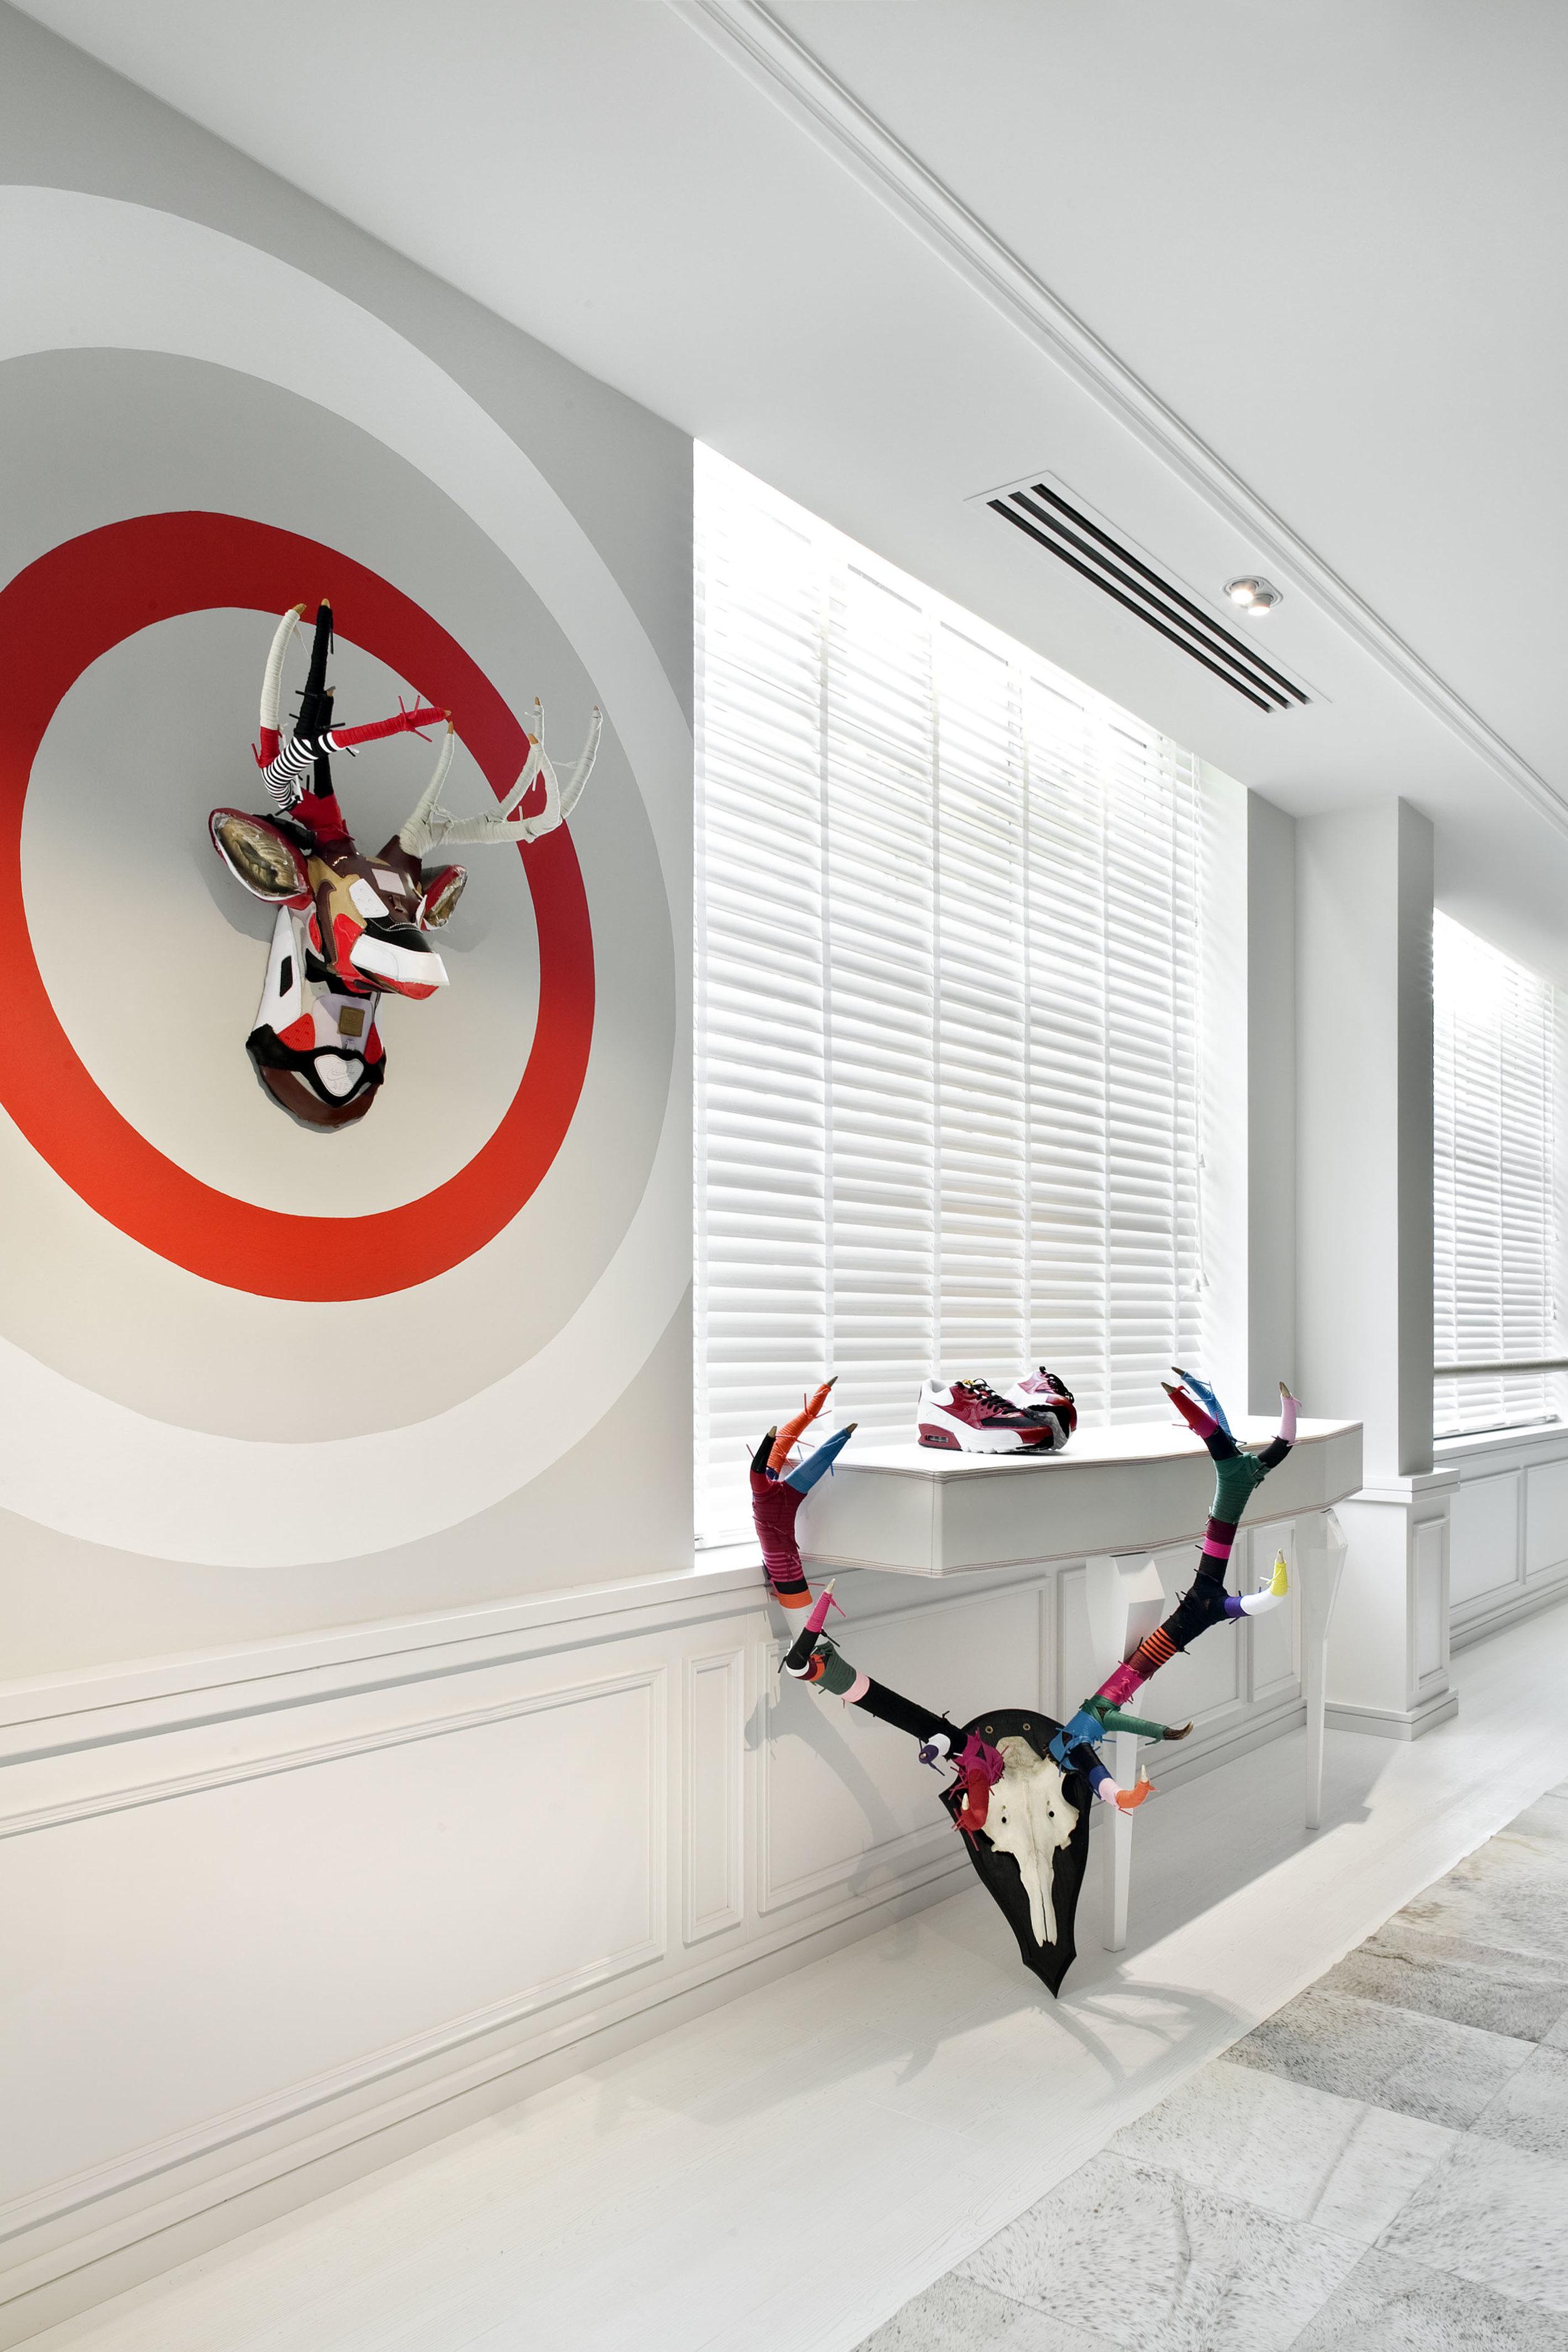 nike_coorporate-interior-design_coordination-berlin_12.jpg